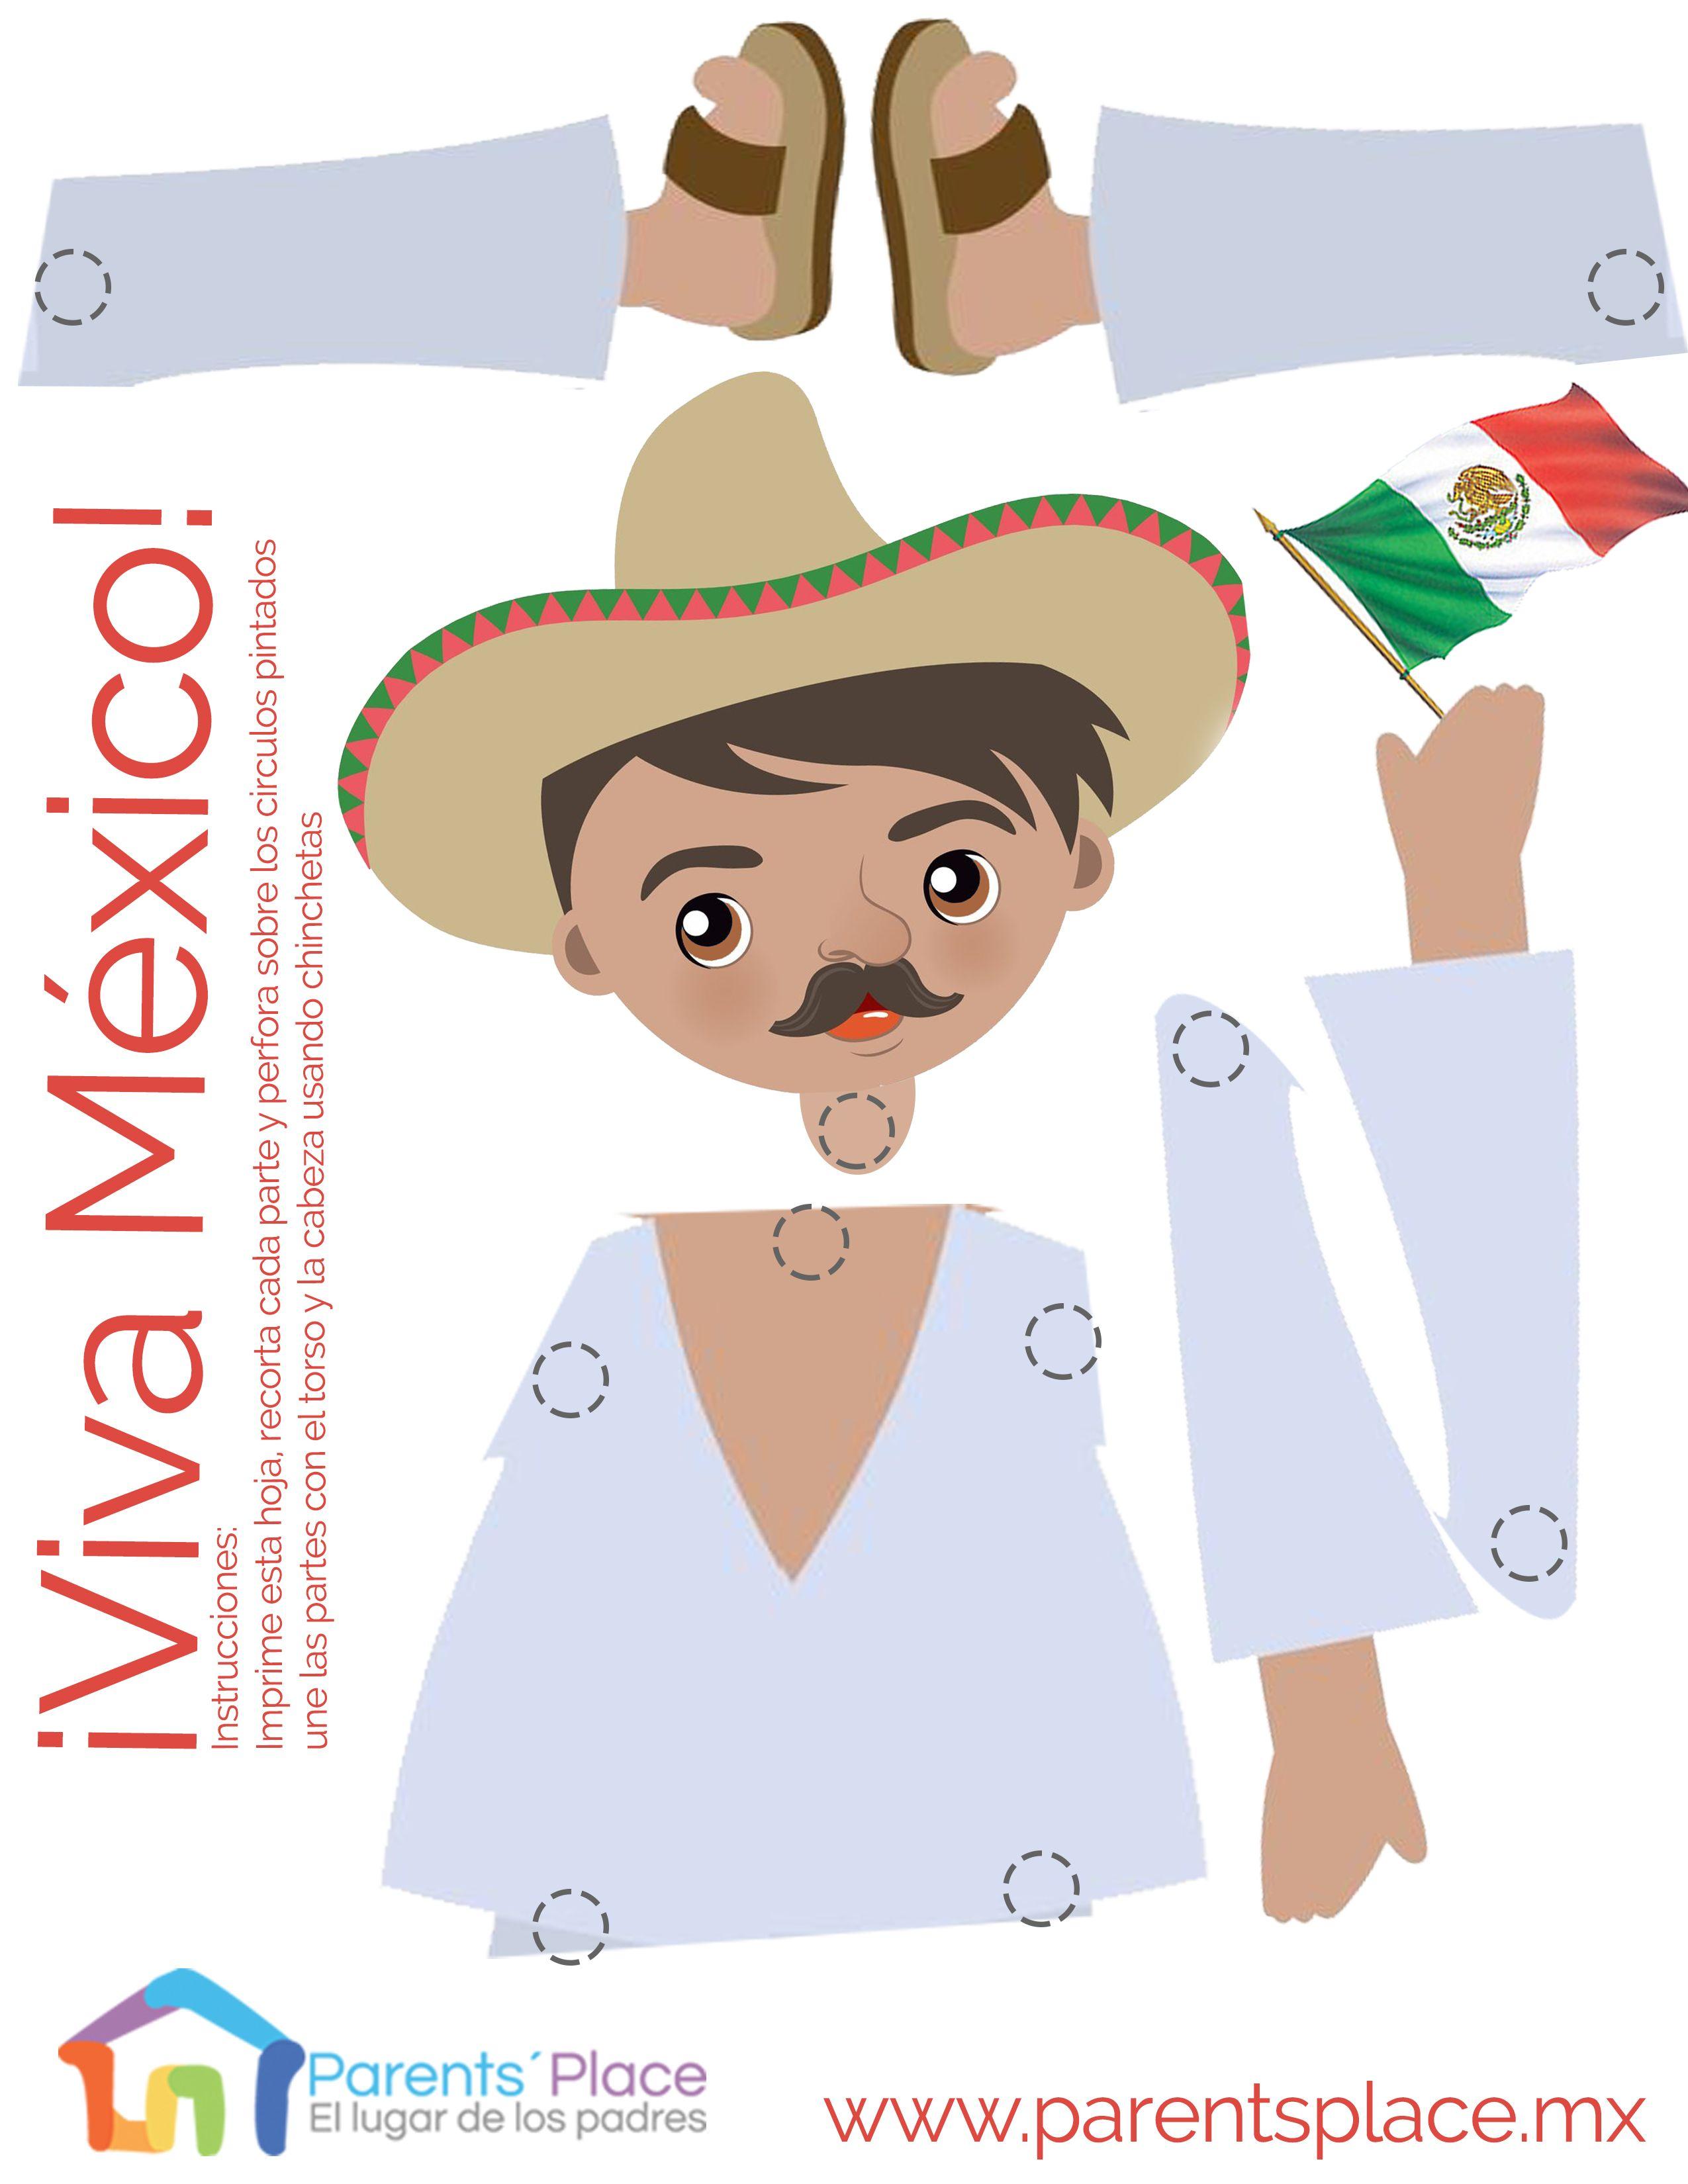 Marioneta Mexicana Board Matching Games Revolucion Mexicana Para